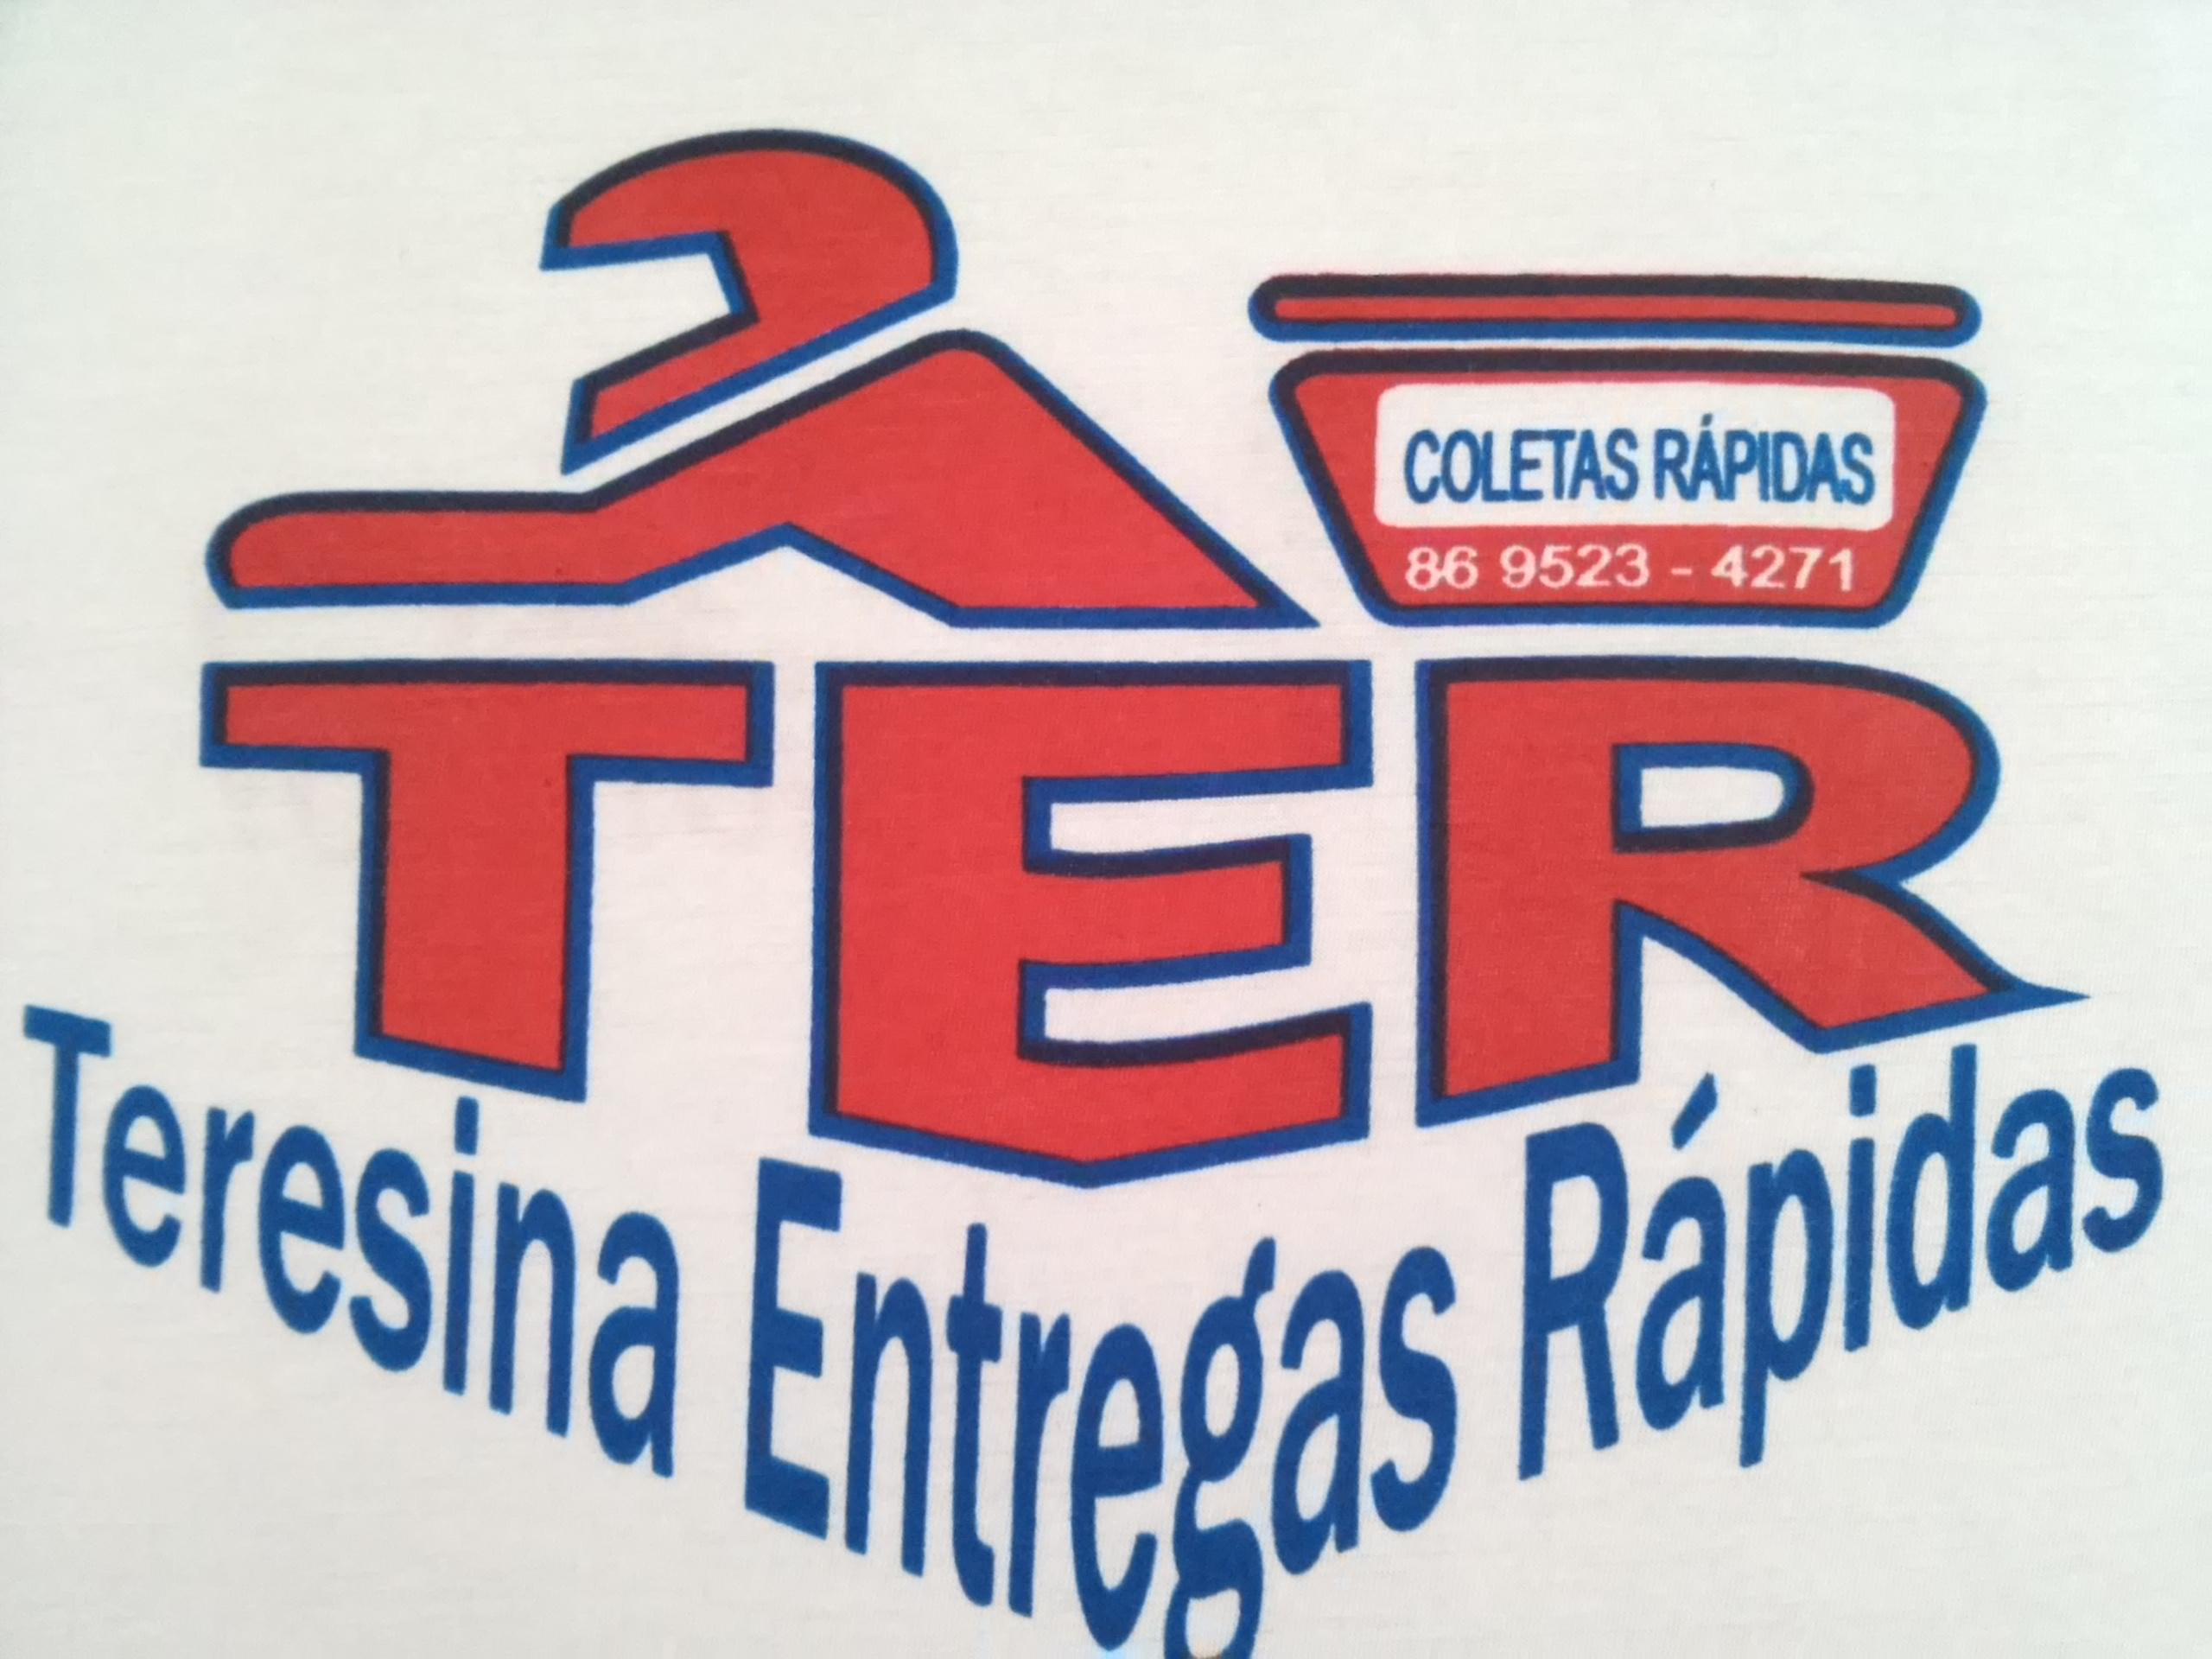 TERESINA ENTREGAS